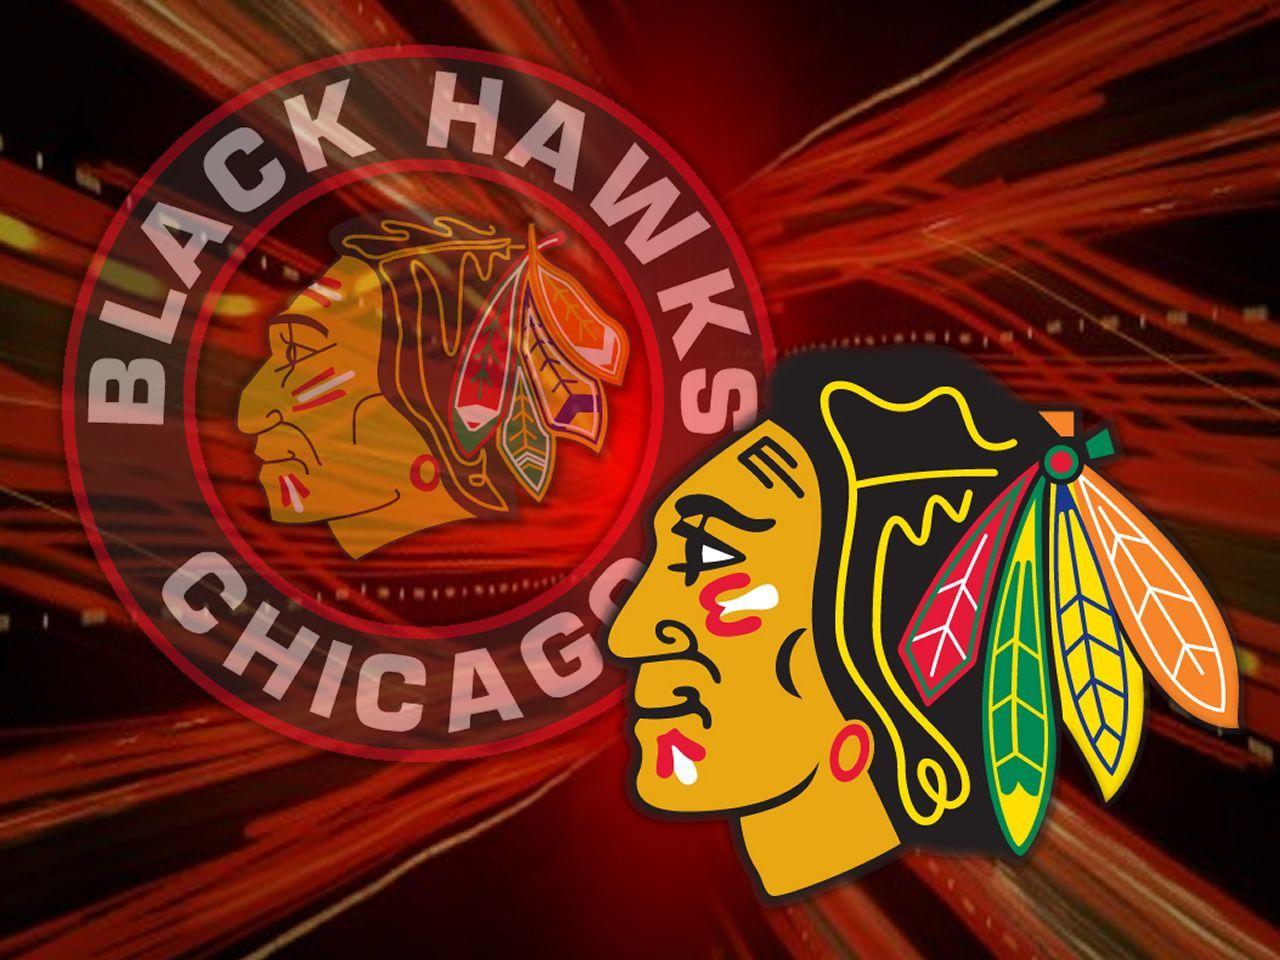 Hawks Chicago Blackhawks Logo Chicago Blackhawks Wallpaper Chicago Blackhawks